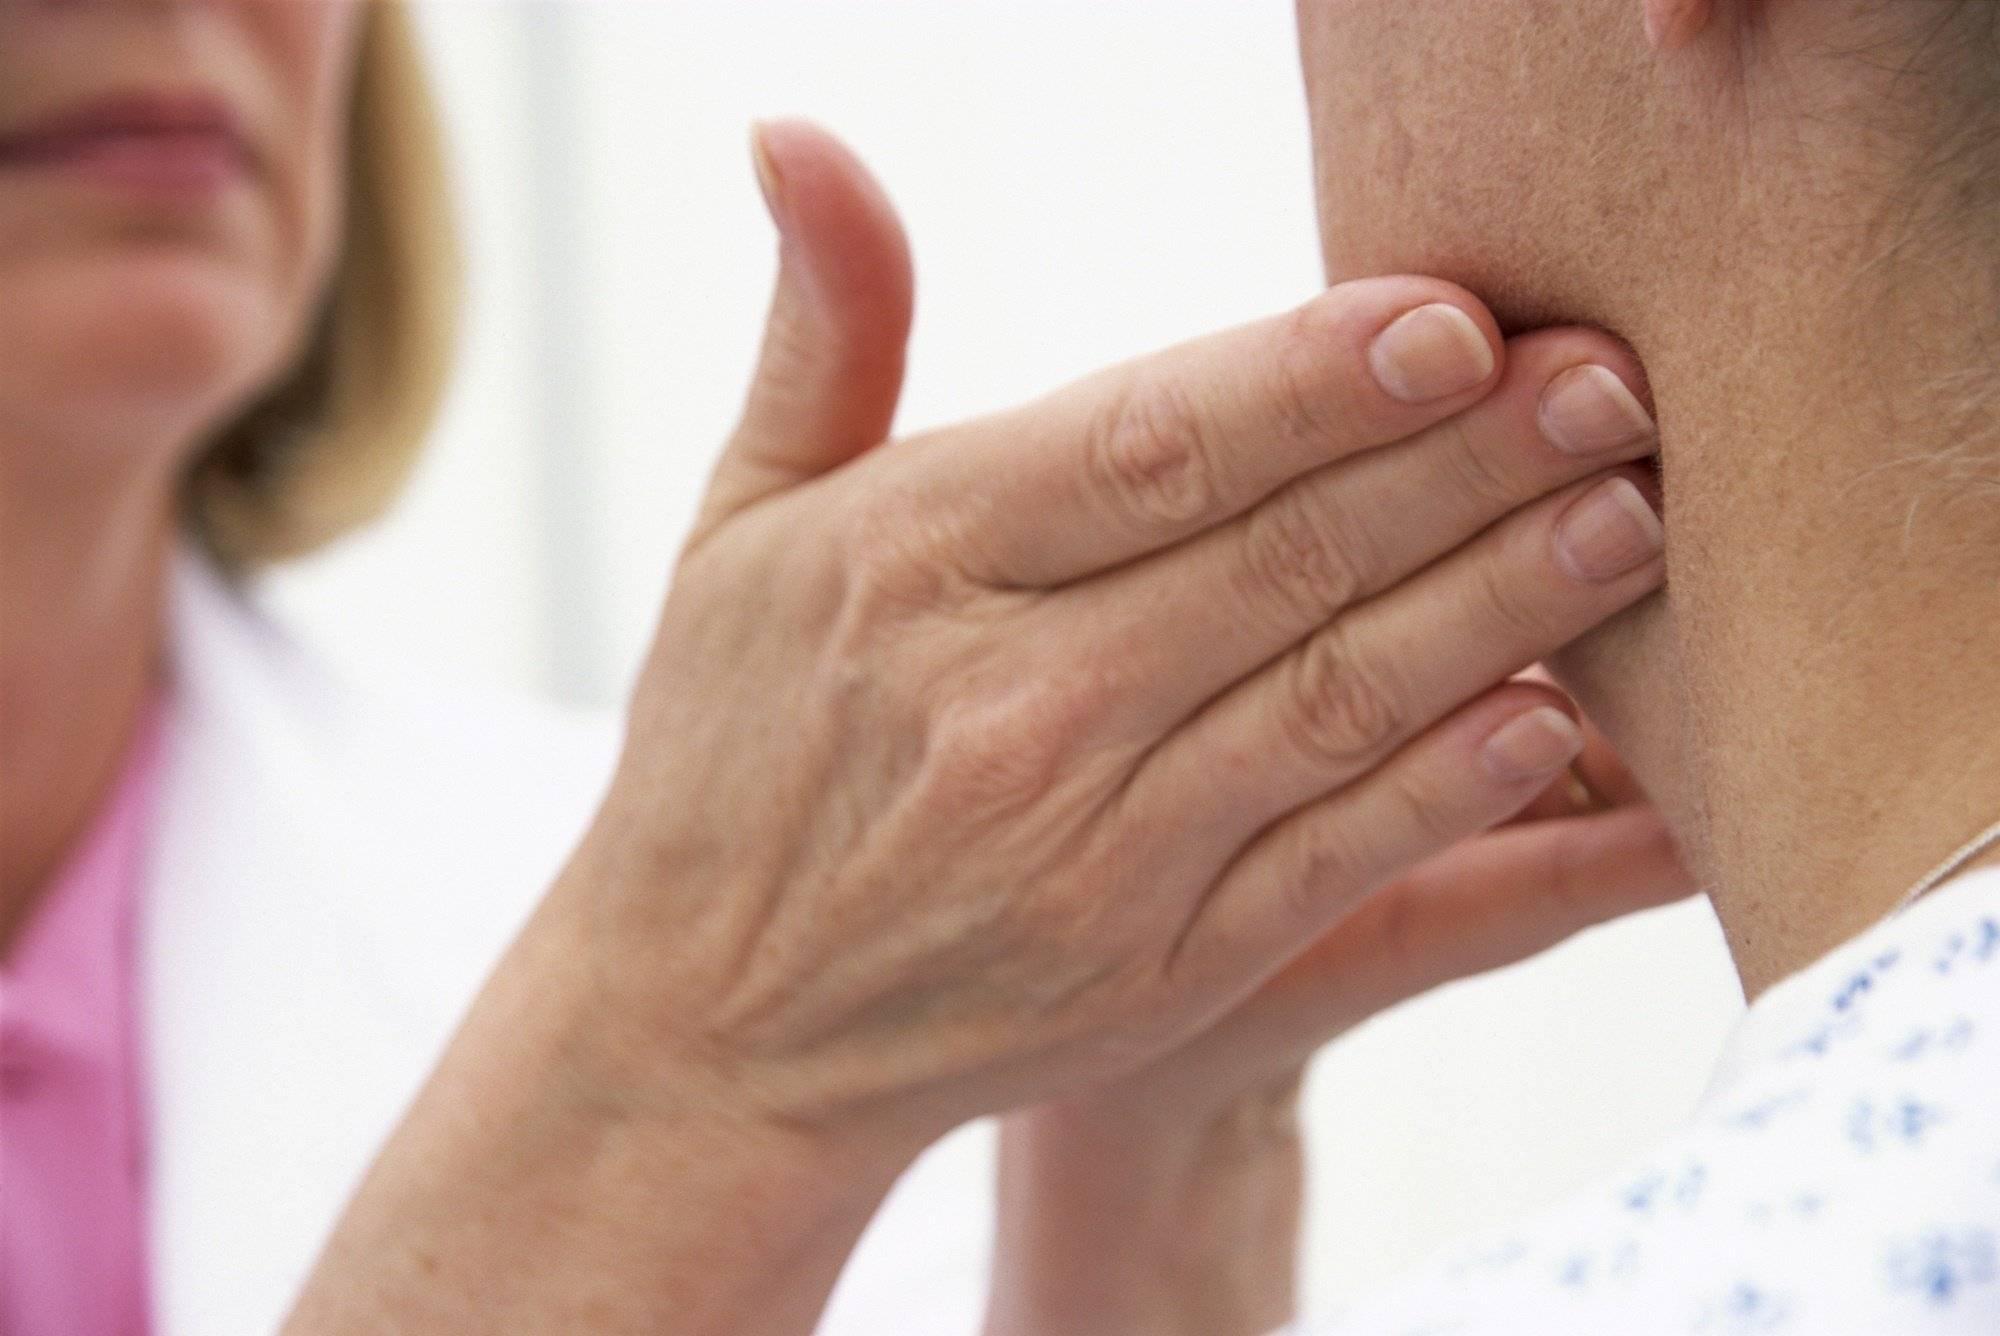 Развитие воспаления лимфоузлов при отите и его влияние на клиническую картину заболевания